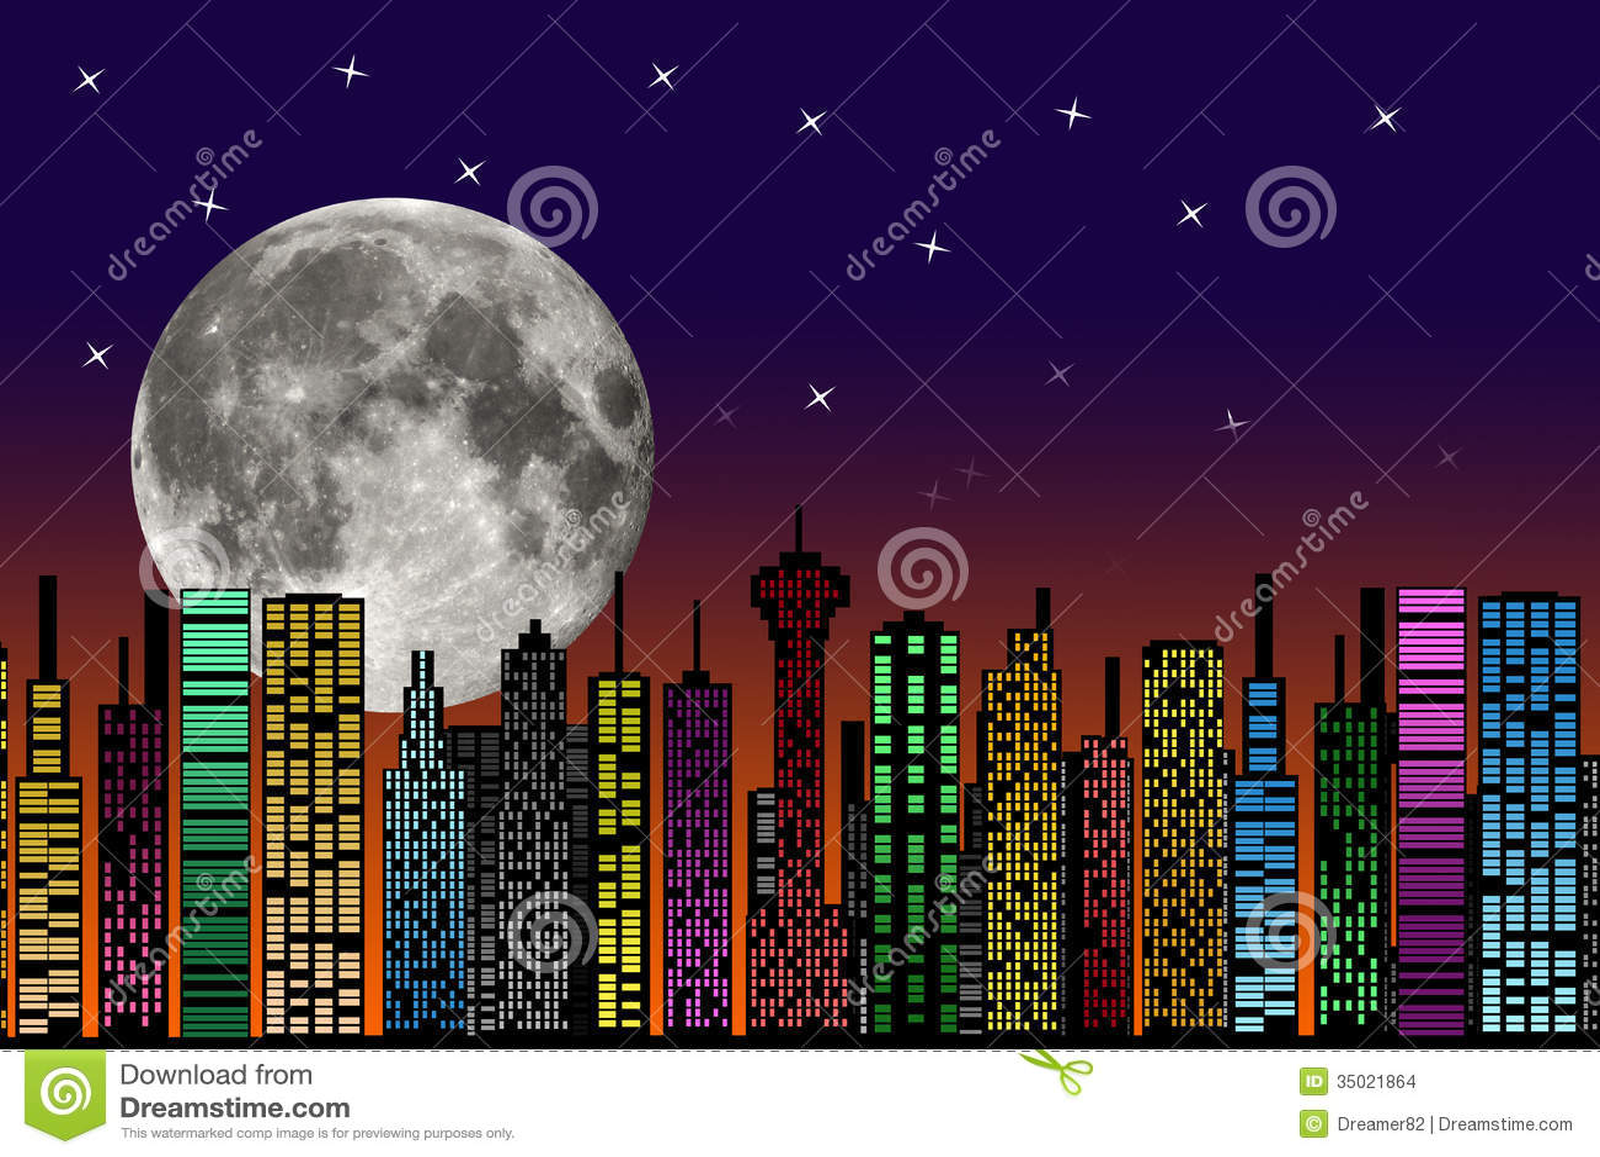 Imagenes De Edificios En Caricatura: City At Night. Buildings Silhouette. Stock Images